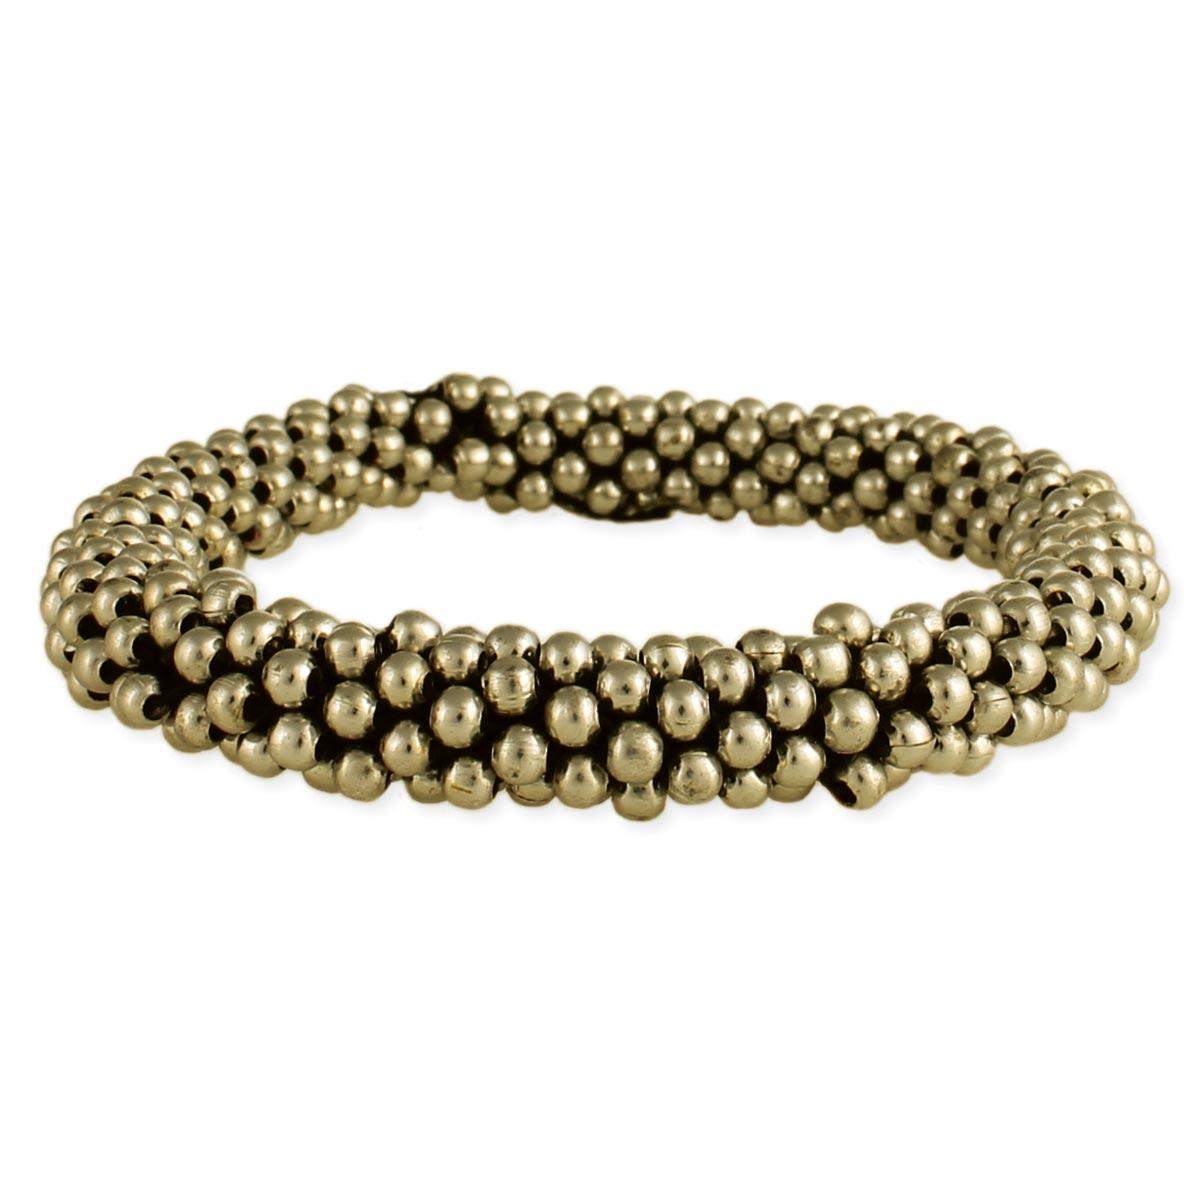 Gold Balls Stretch Bracelet   Hair Holder. View Detailed Images 1 35d56c11a00